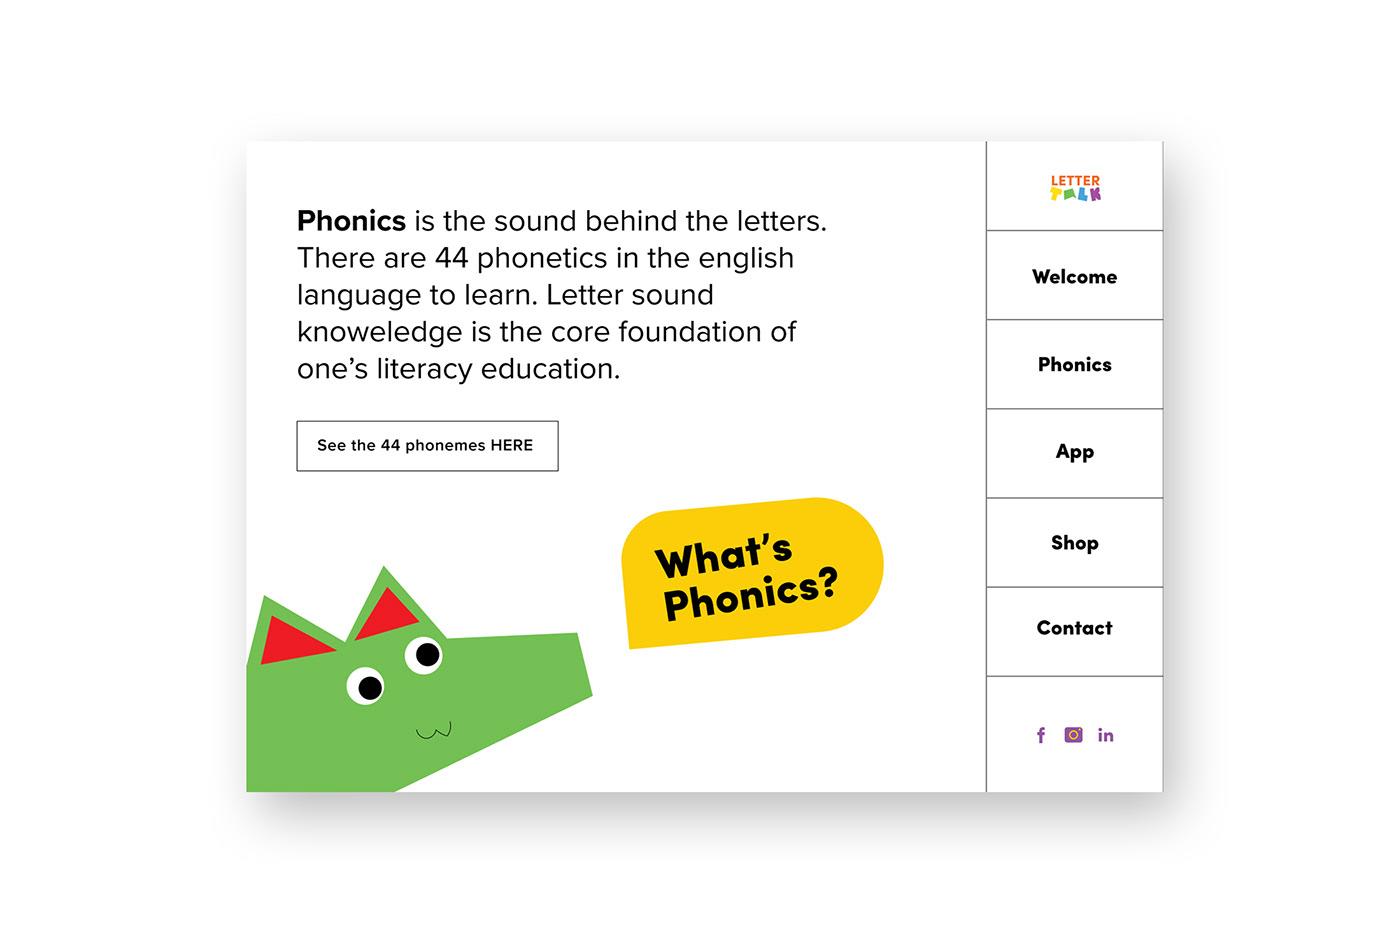 branding  graphic design  ILLUSTRATION  phonics educational tablet design